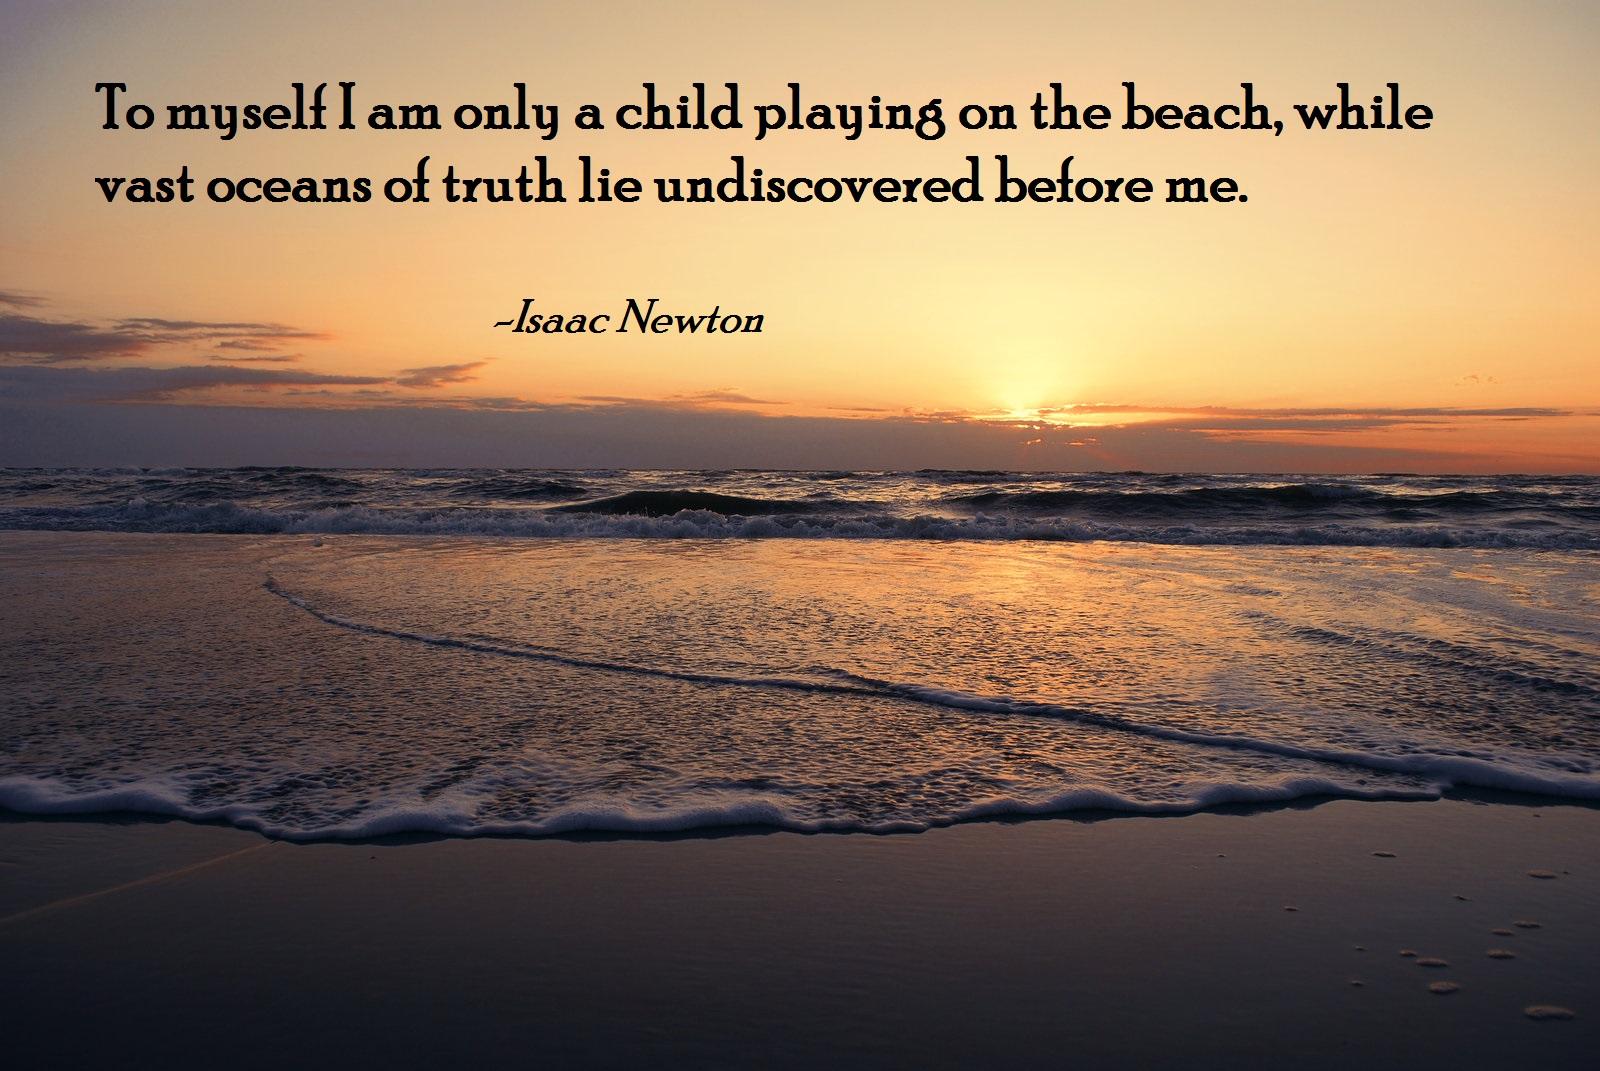 Sailing Quotes Inspirational Quotesgram: Inspirational Quotes About The Beach. QuotesGram